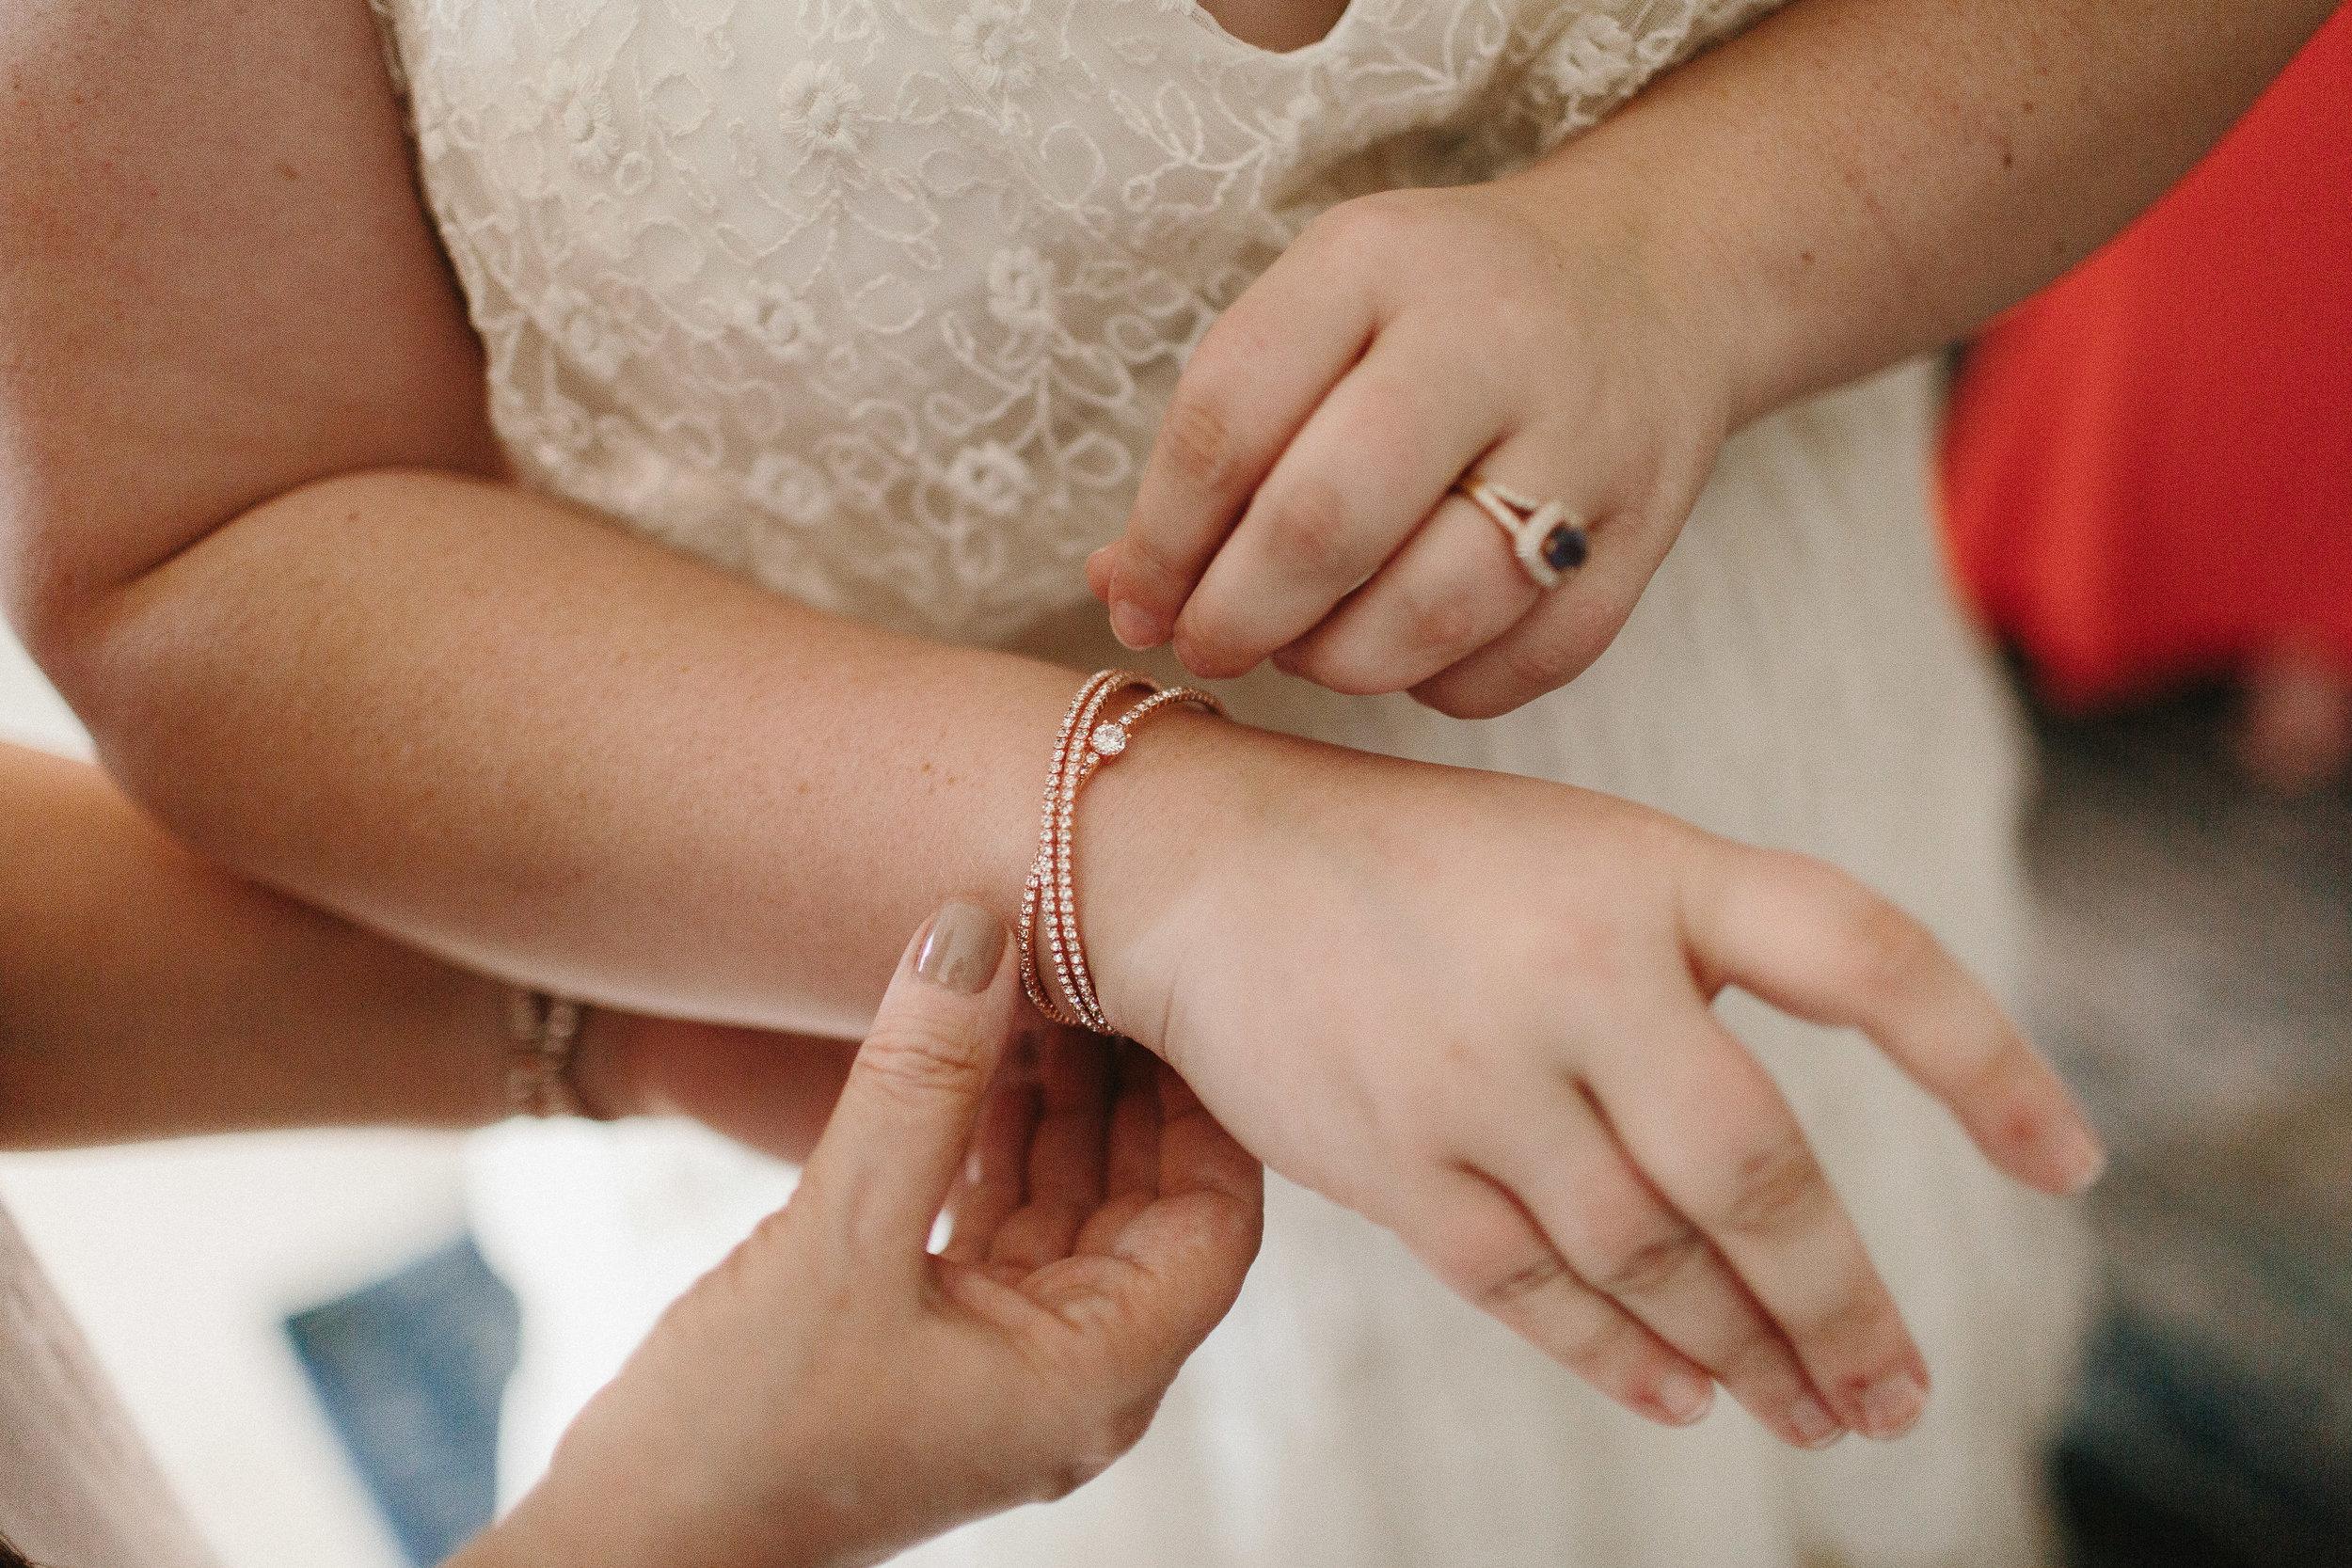 destin_sunset_beach_elopement_intimate_wedding_photographer_florida_documentary_1035.jpg